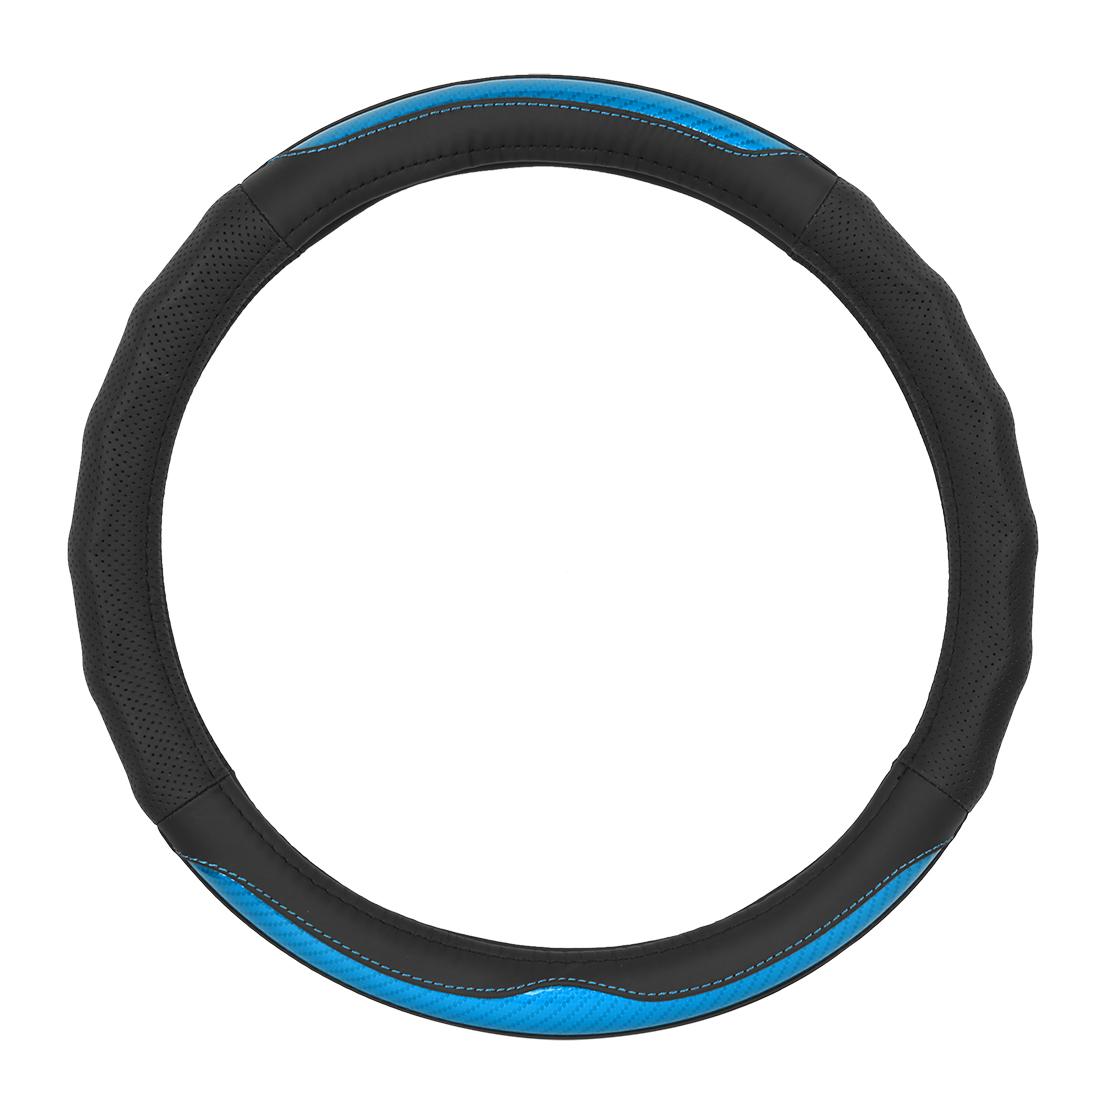 "38cm 15"" Car Auto Universal Steering Wheel Cover Anti-Slip Leather Black Blue"